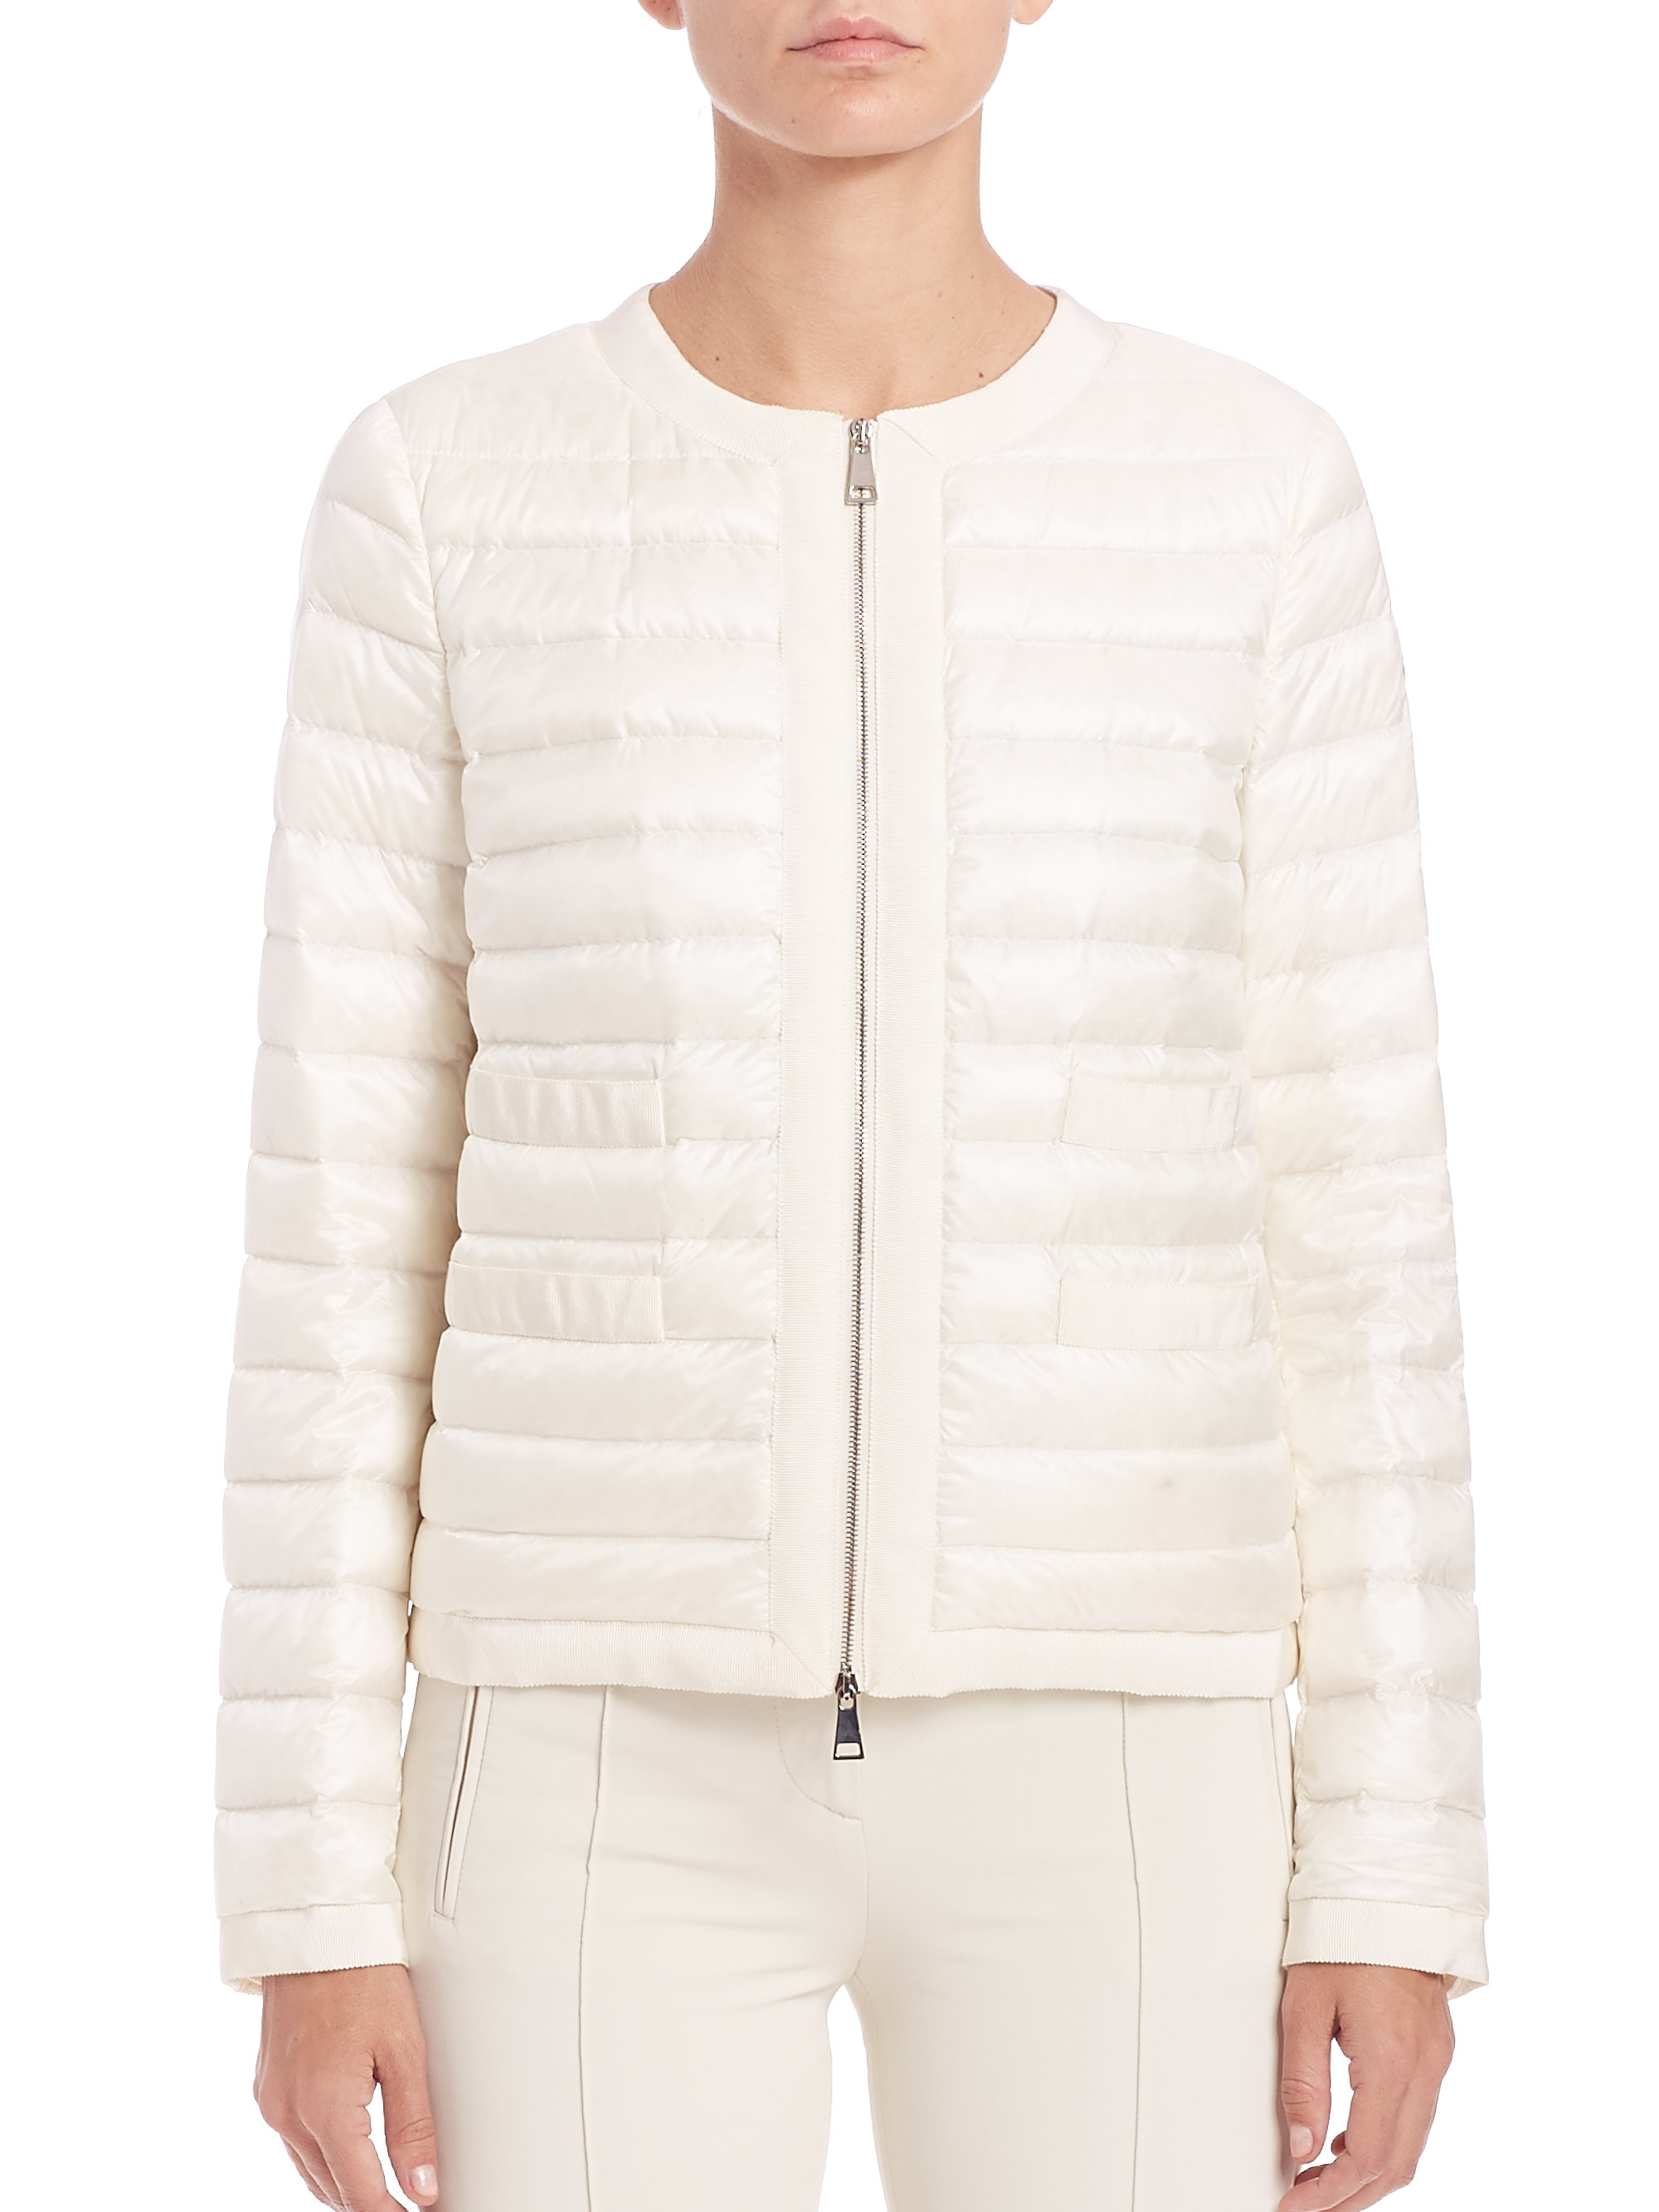 moncler jacket white